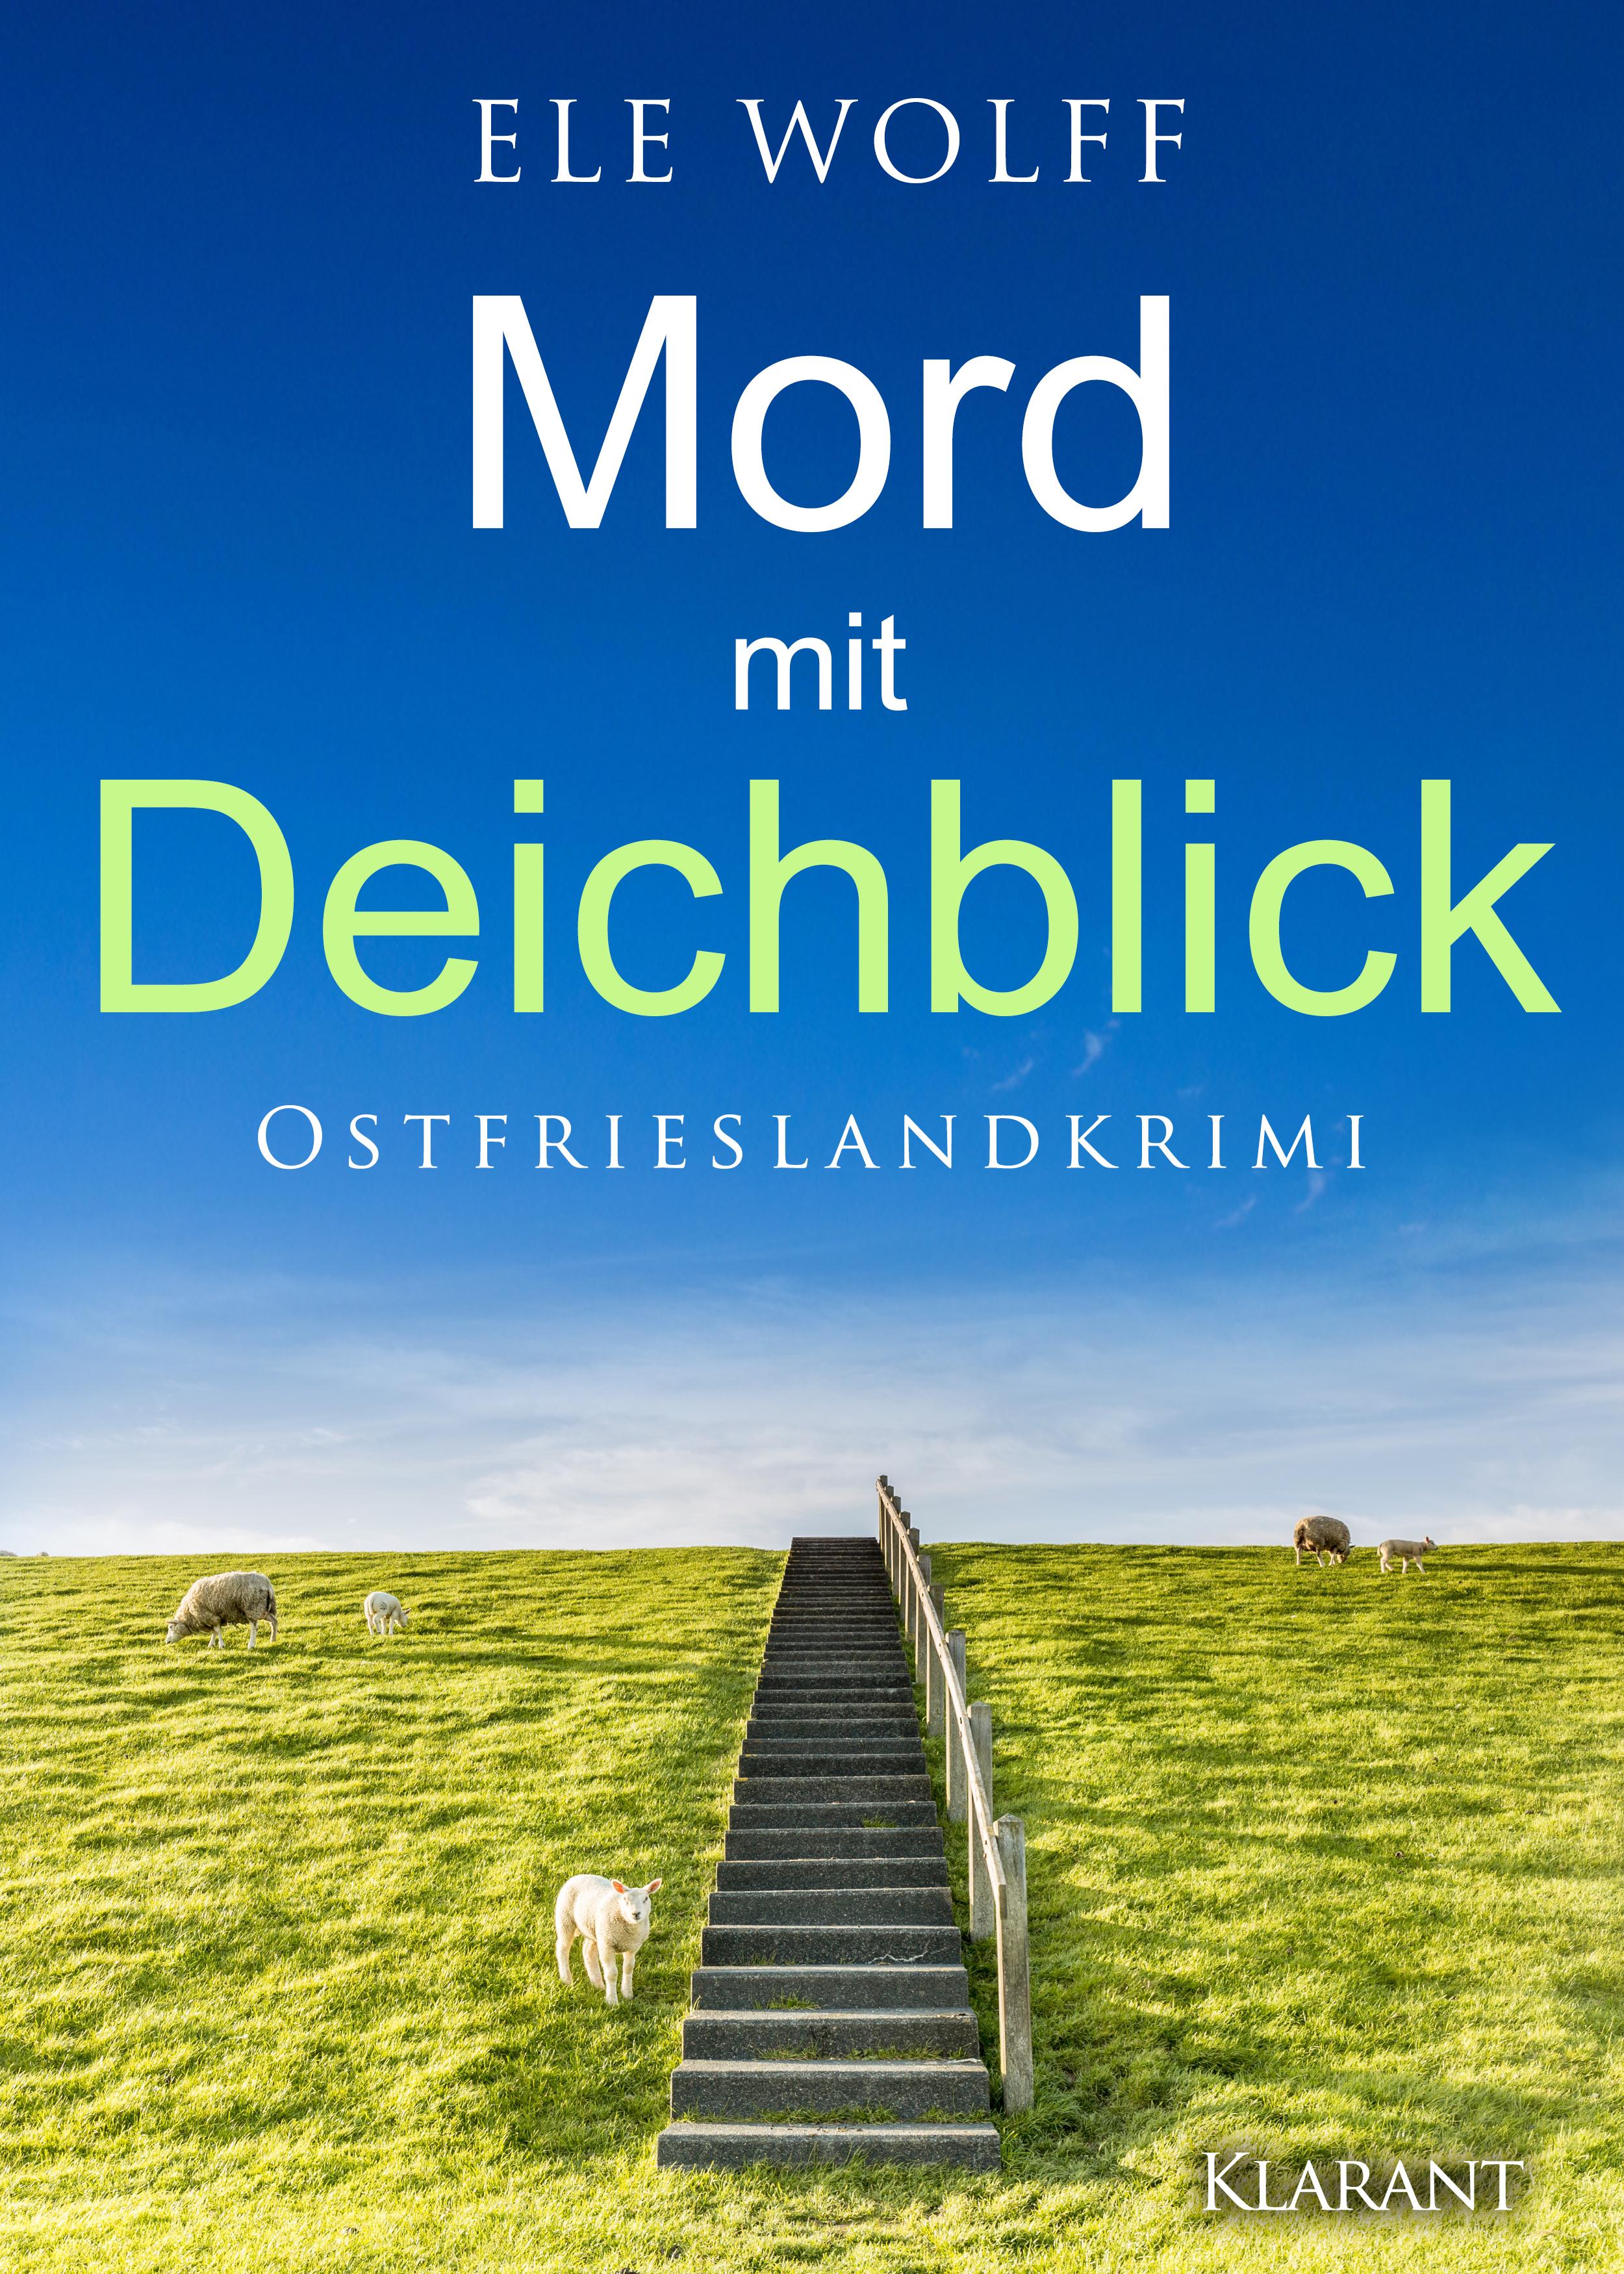 6491560931365719_MordmitDeichblick9783955739904.jpg